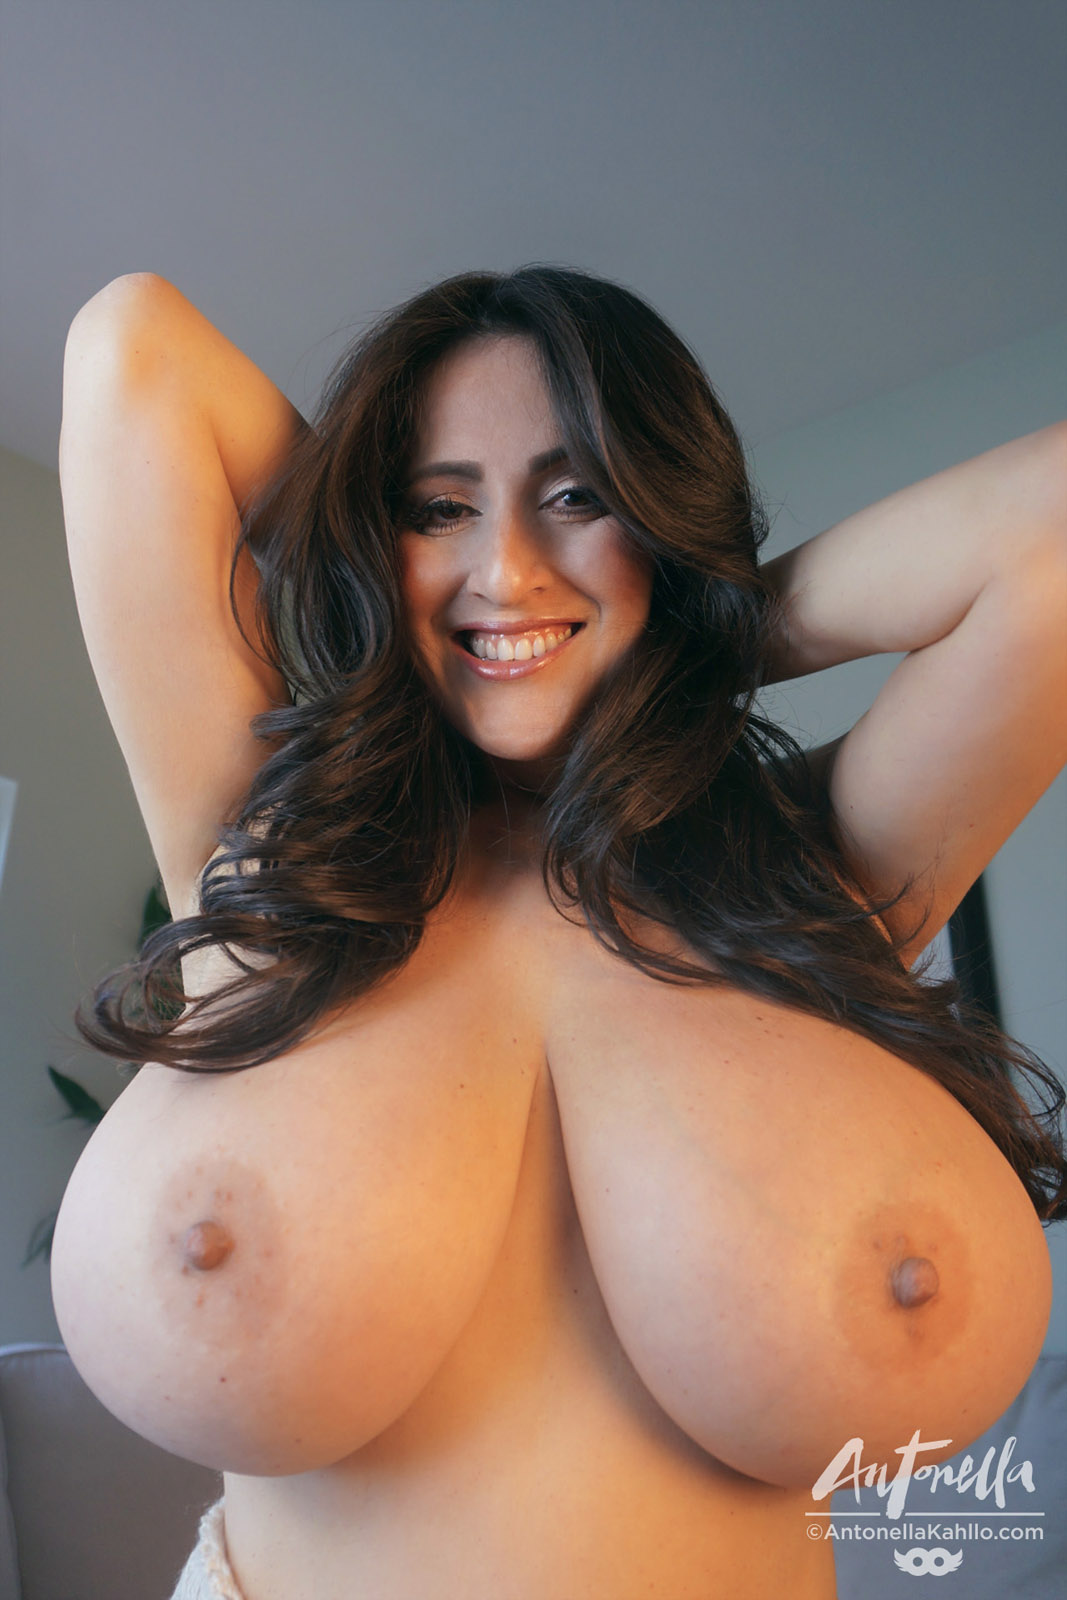 antonella kahllo mesh goddess - prime curves